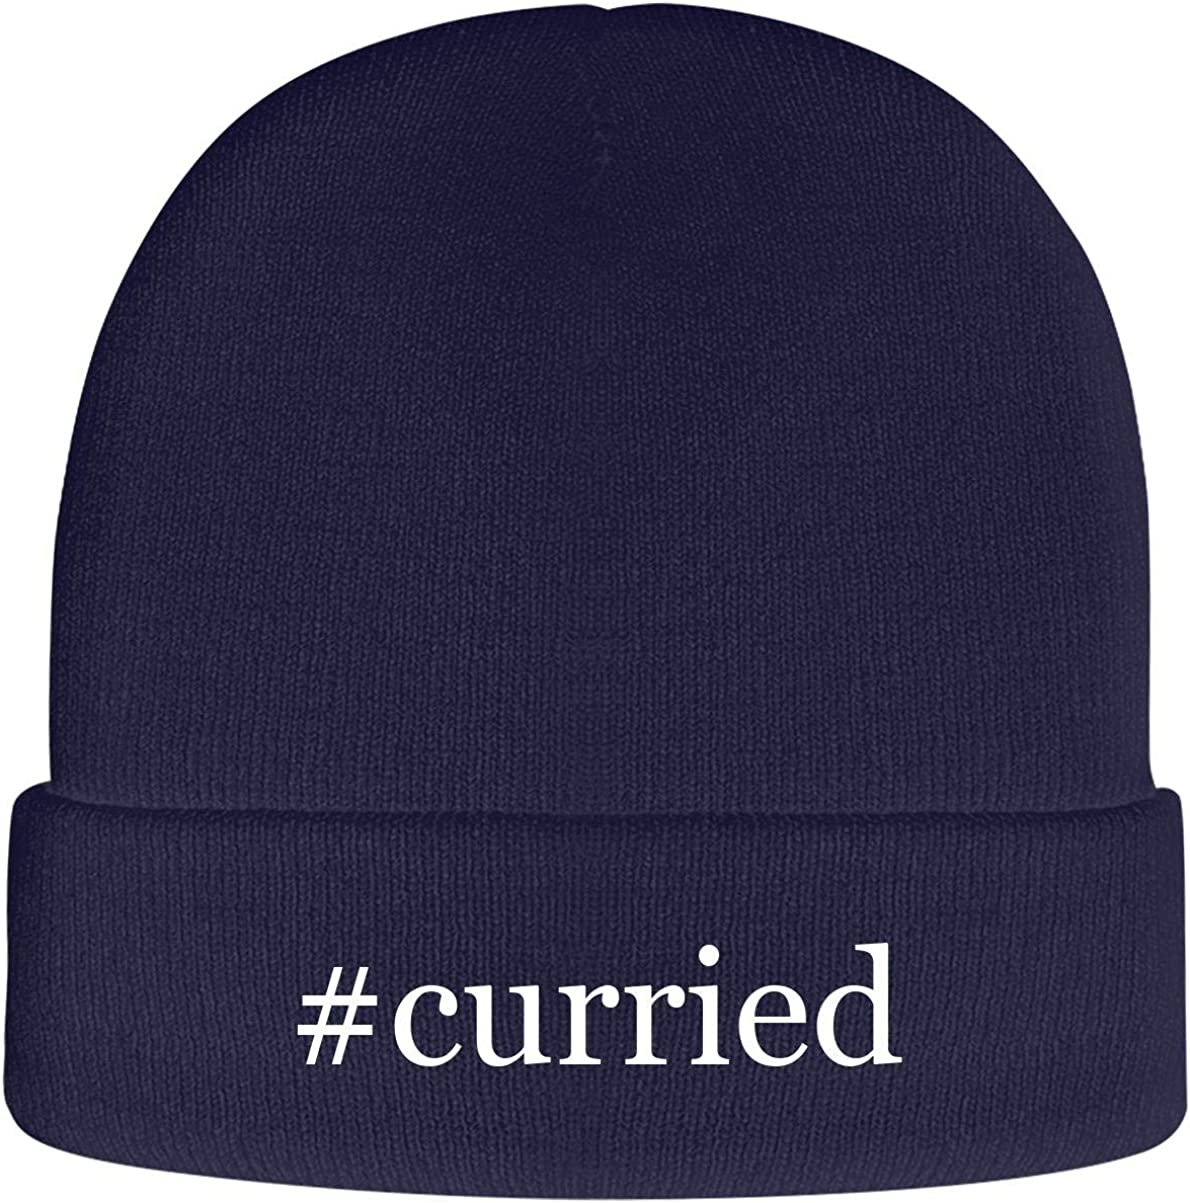 One Legging it Around #Curried - Soft Hashtag Adult Beanie Cap